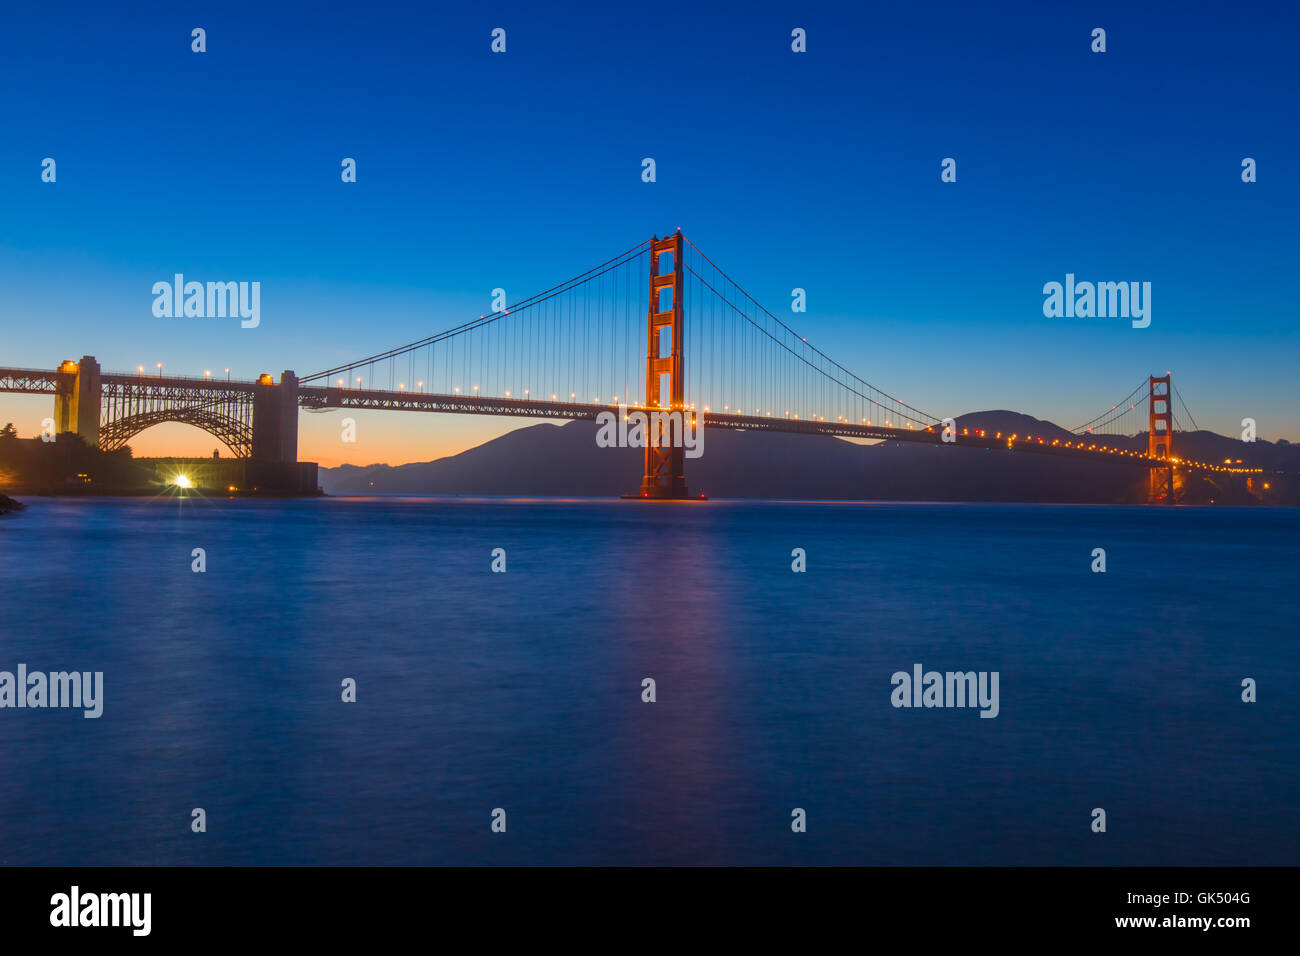 Golden Gate Bridge in San Francisco CA at night - Stock Image